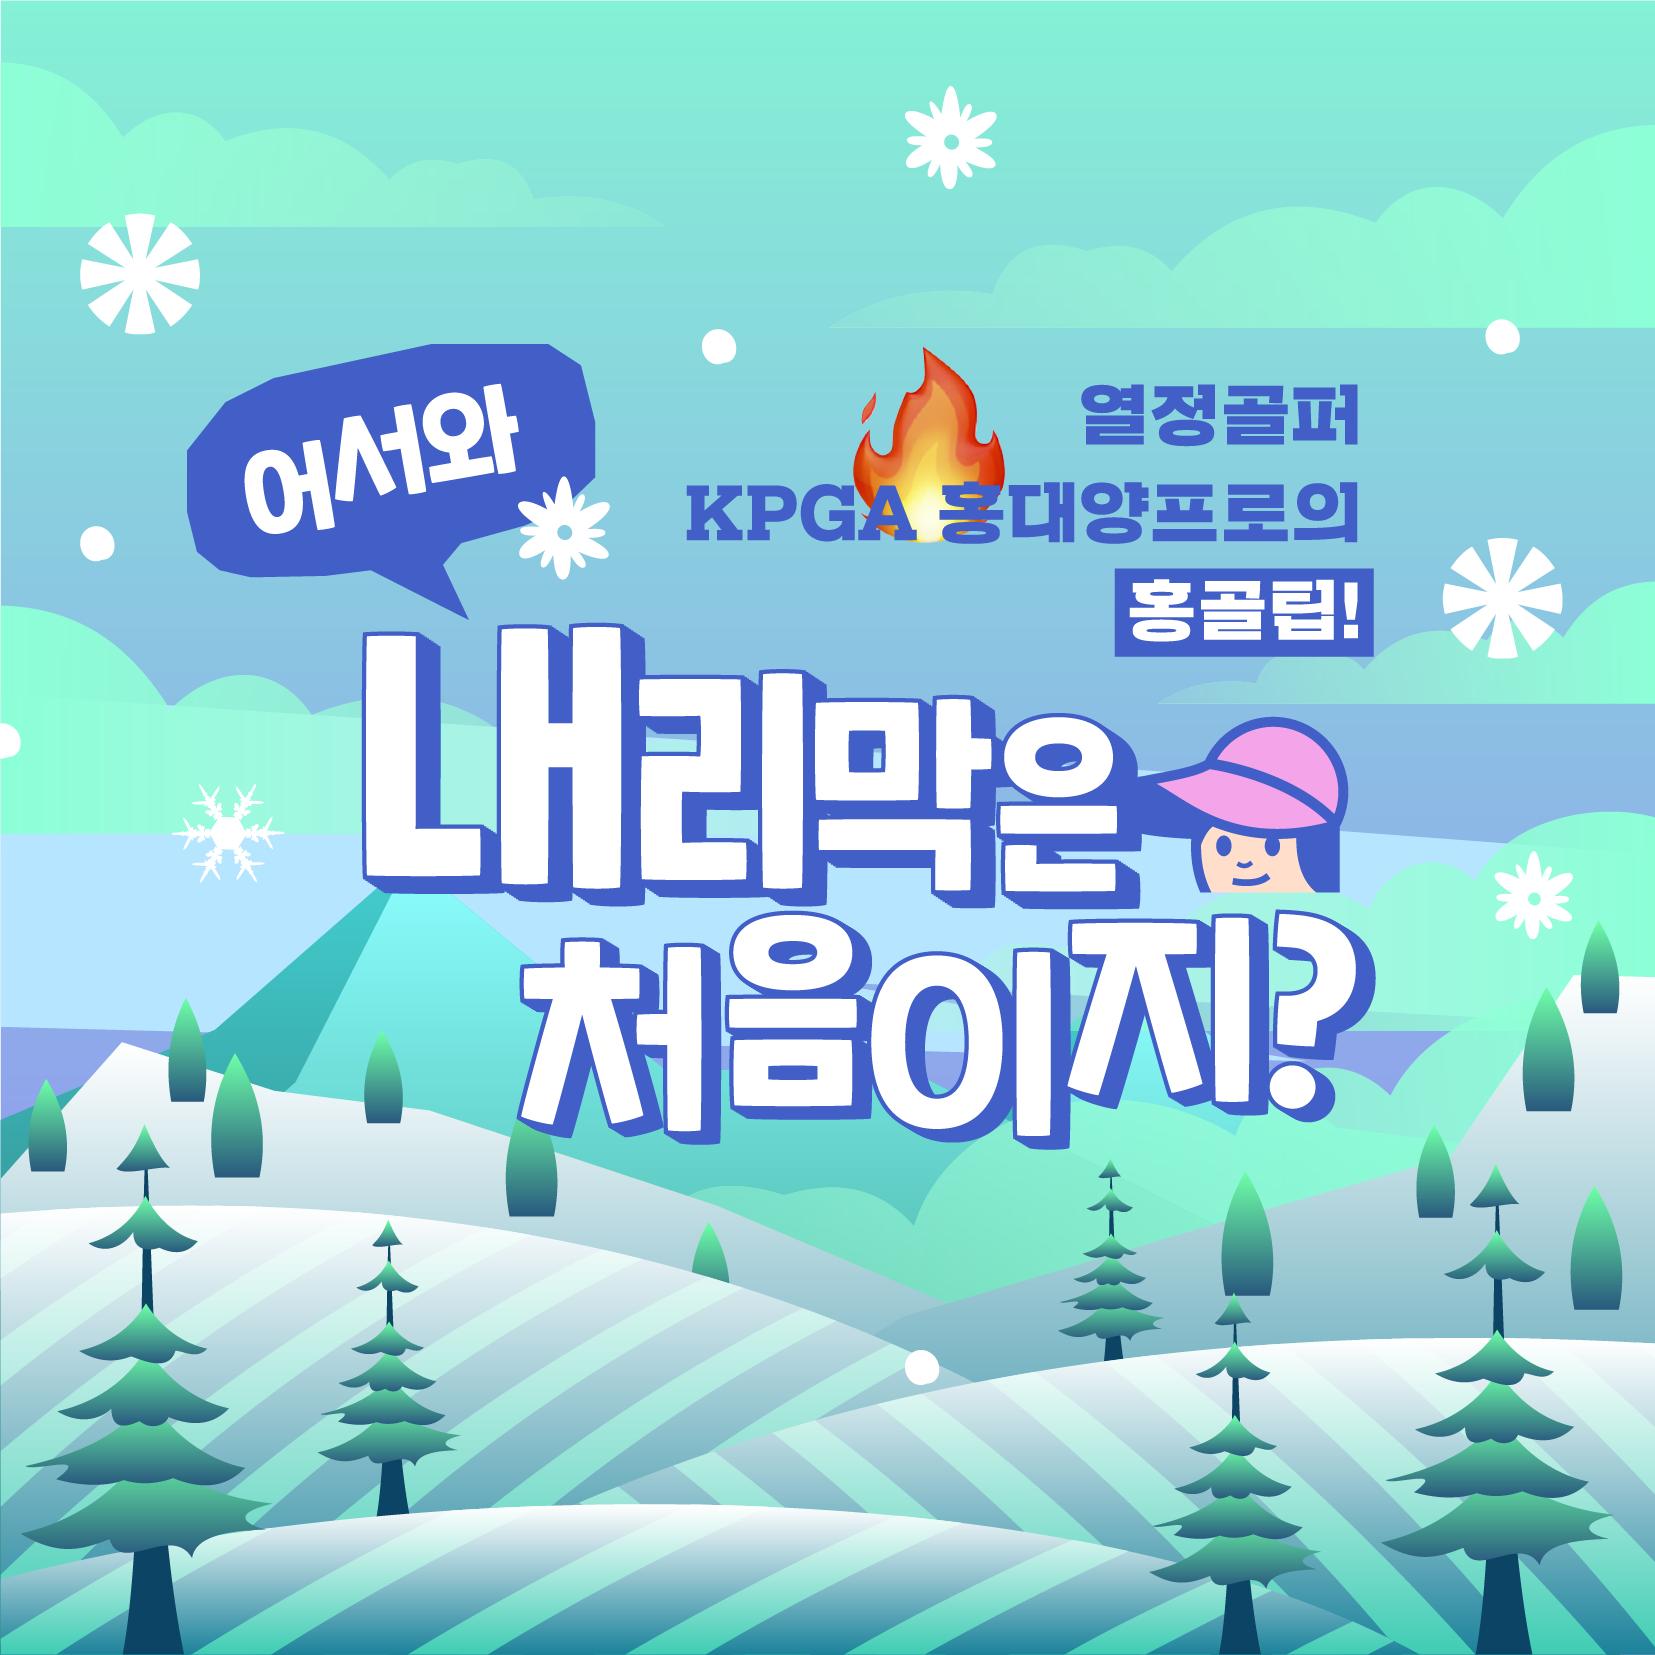 kpga-홍대양-프로-x-김캐디-그린-주위-내리막-경사-꿀팁-홍골팁-4탄